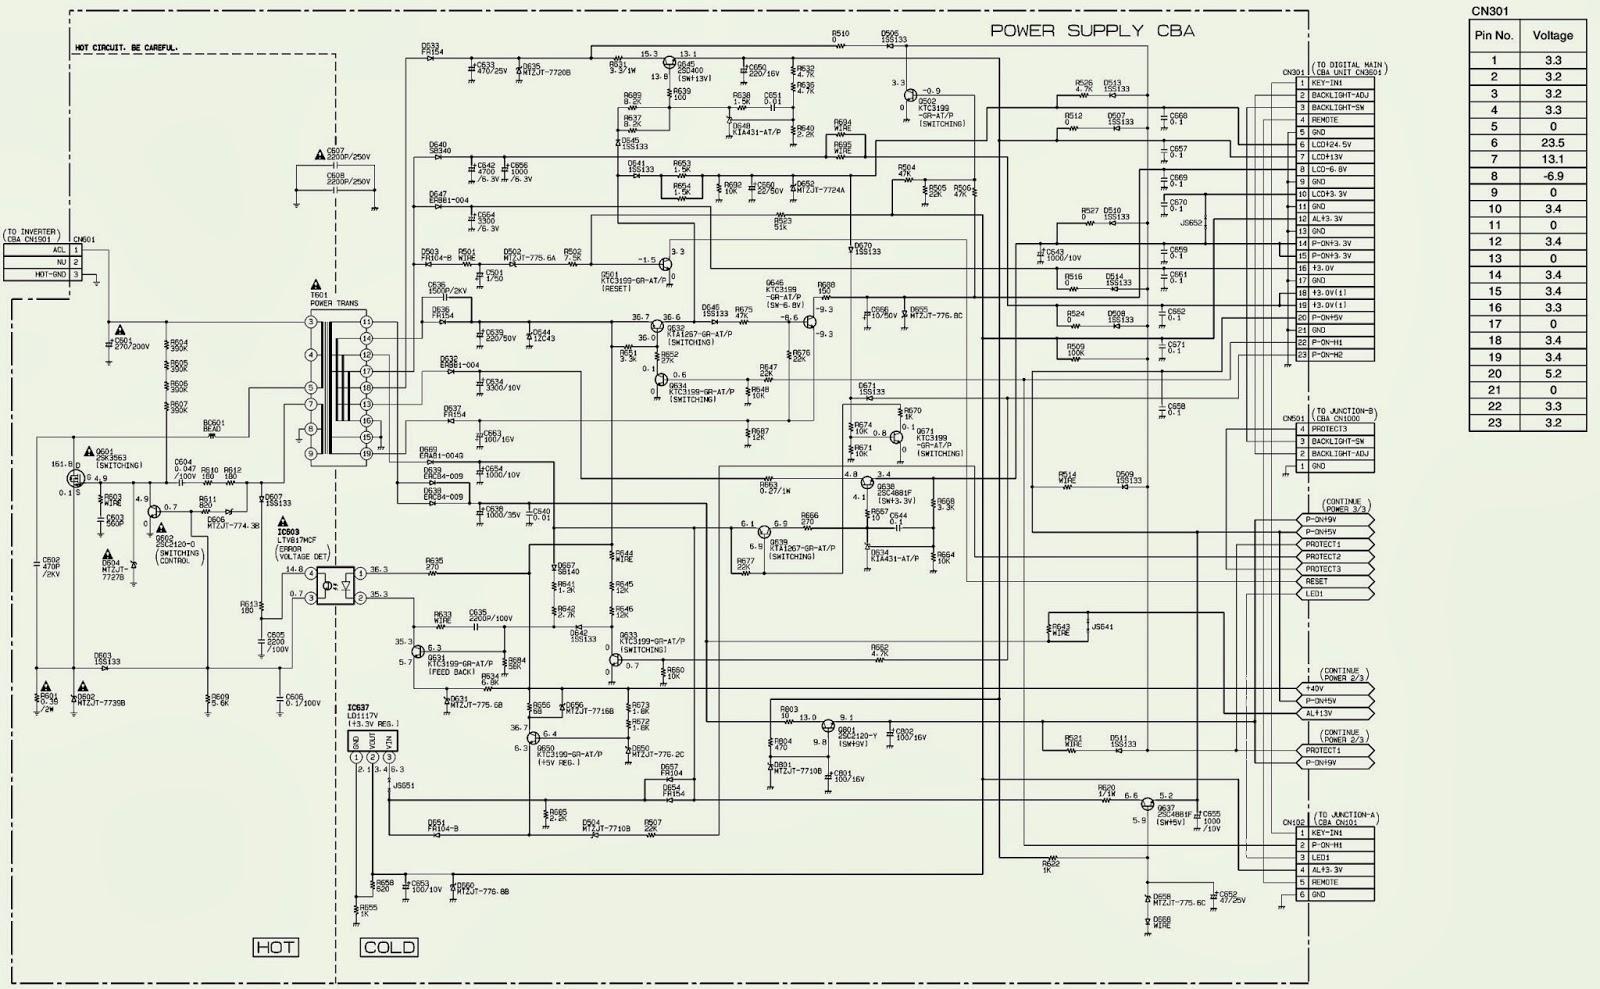 direct tv schematic diagram